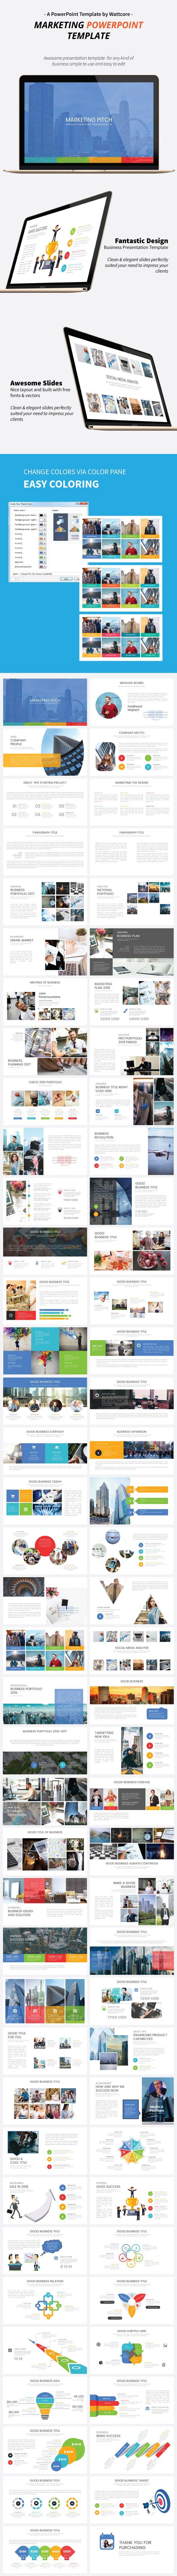 marketing pitch presentation fonts logos icons pinterest